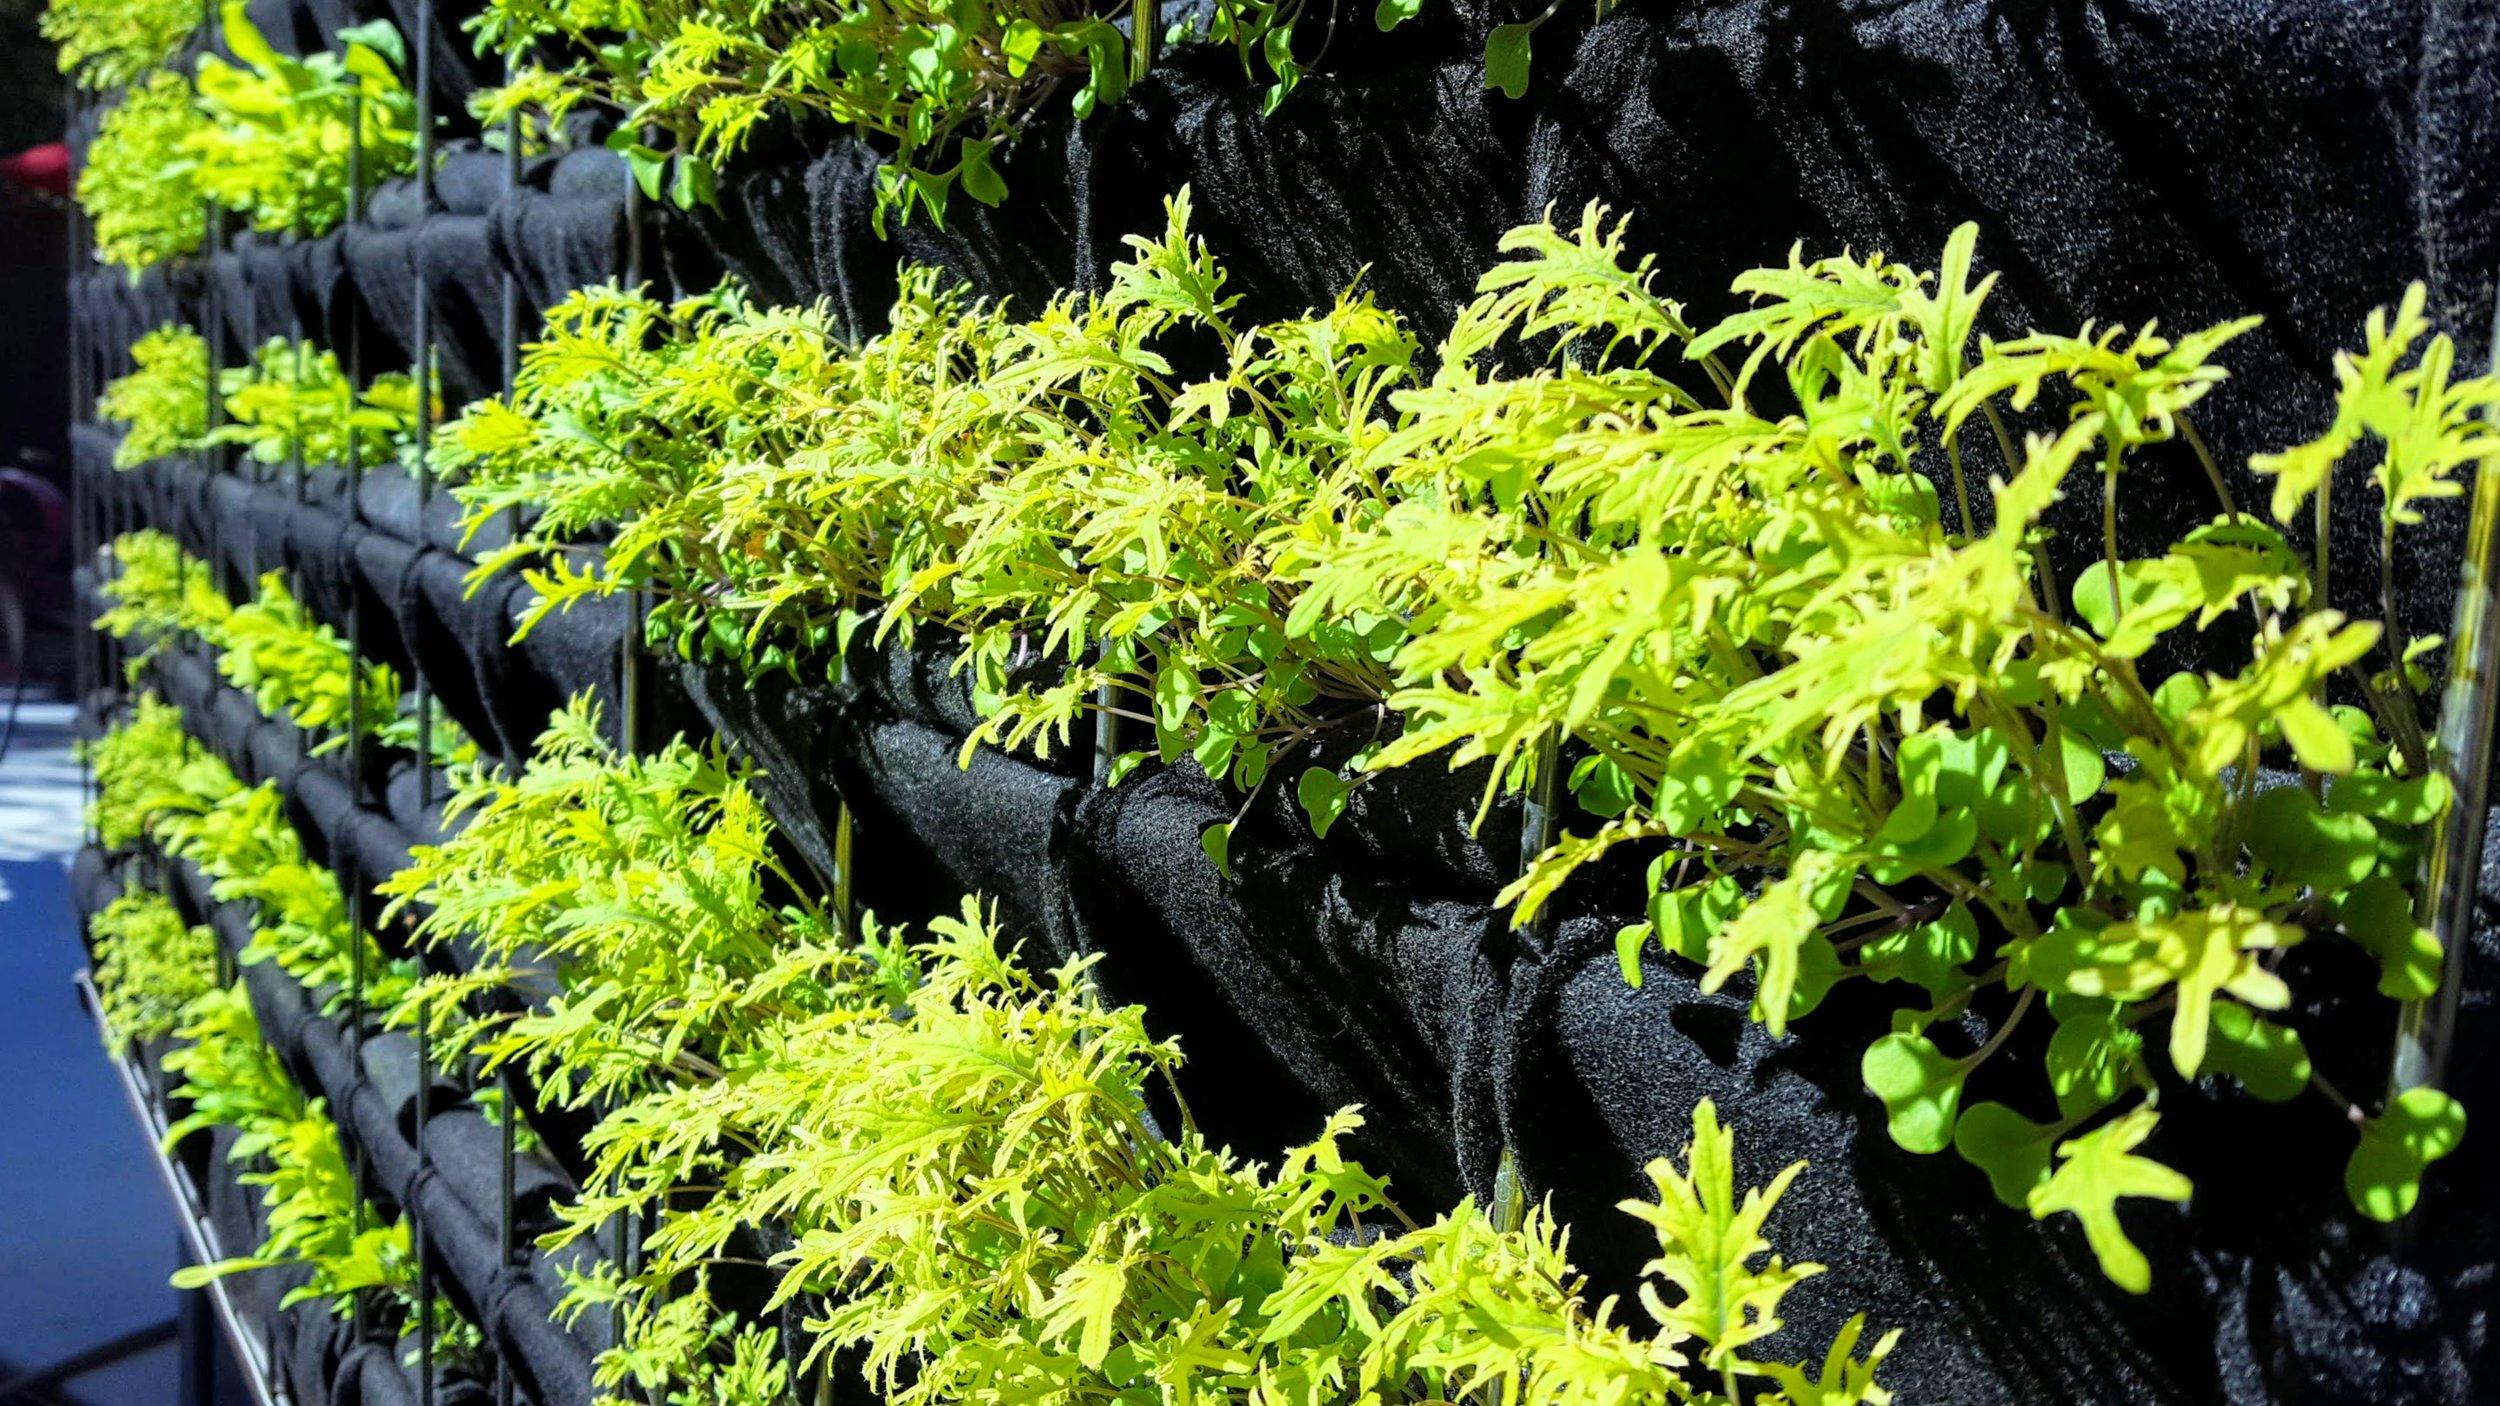 Florafelt Pro System Aquaponics Chris Bribach Sonoma California 15.jpg